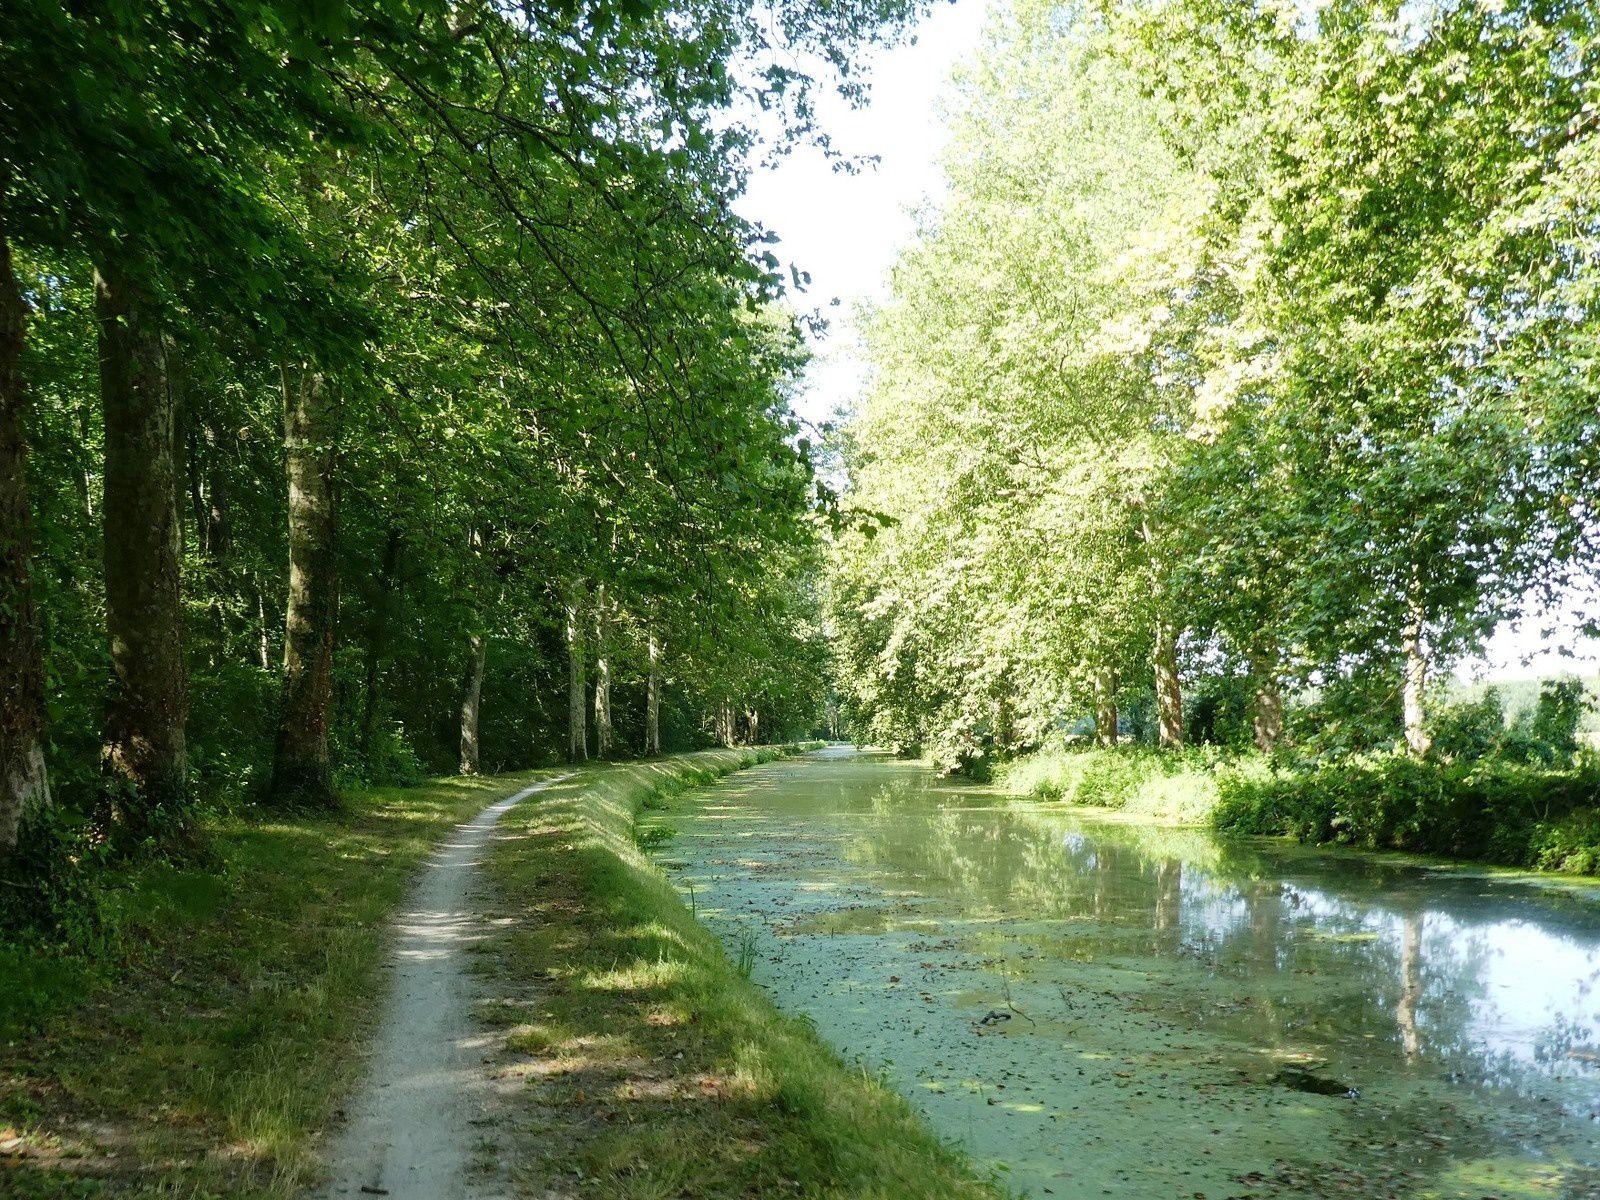 Canal Briare, Canal d'Orleans, Loire